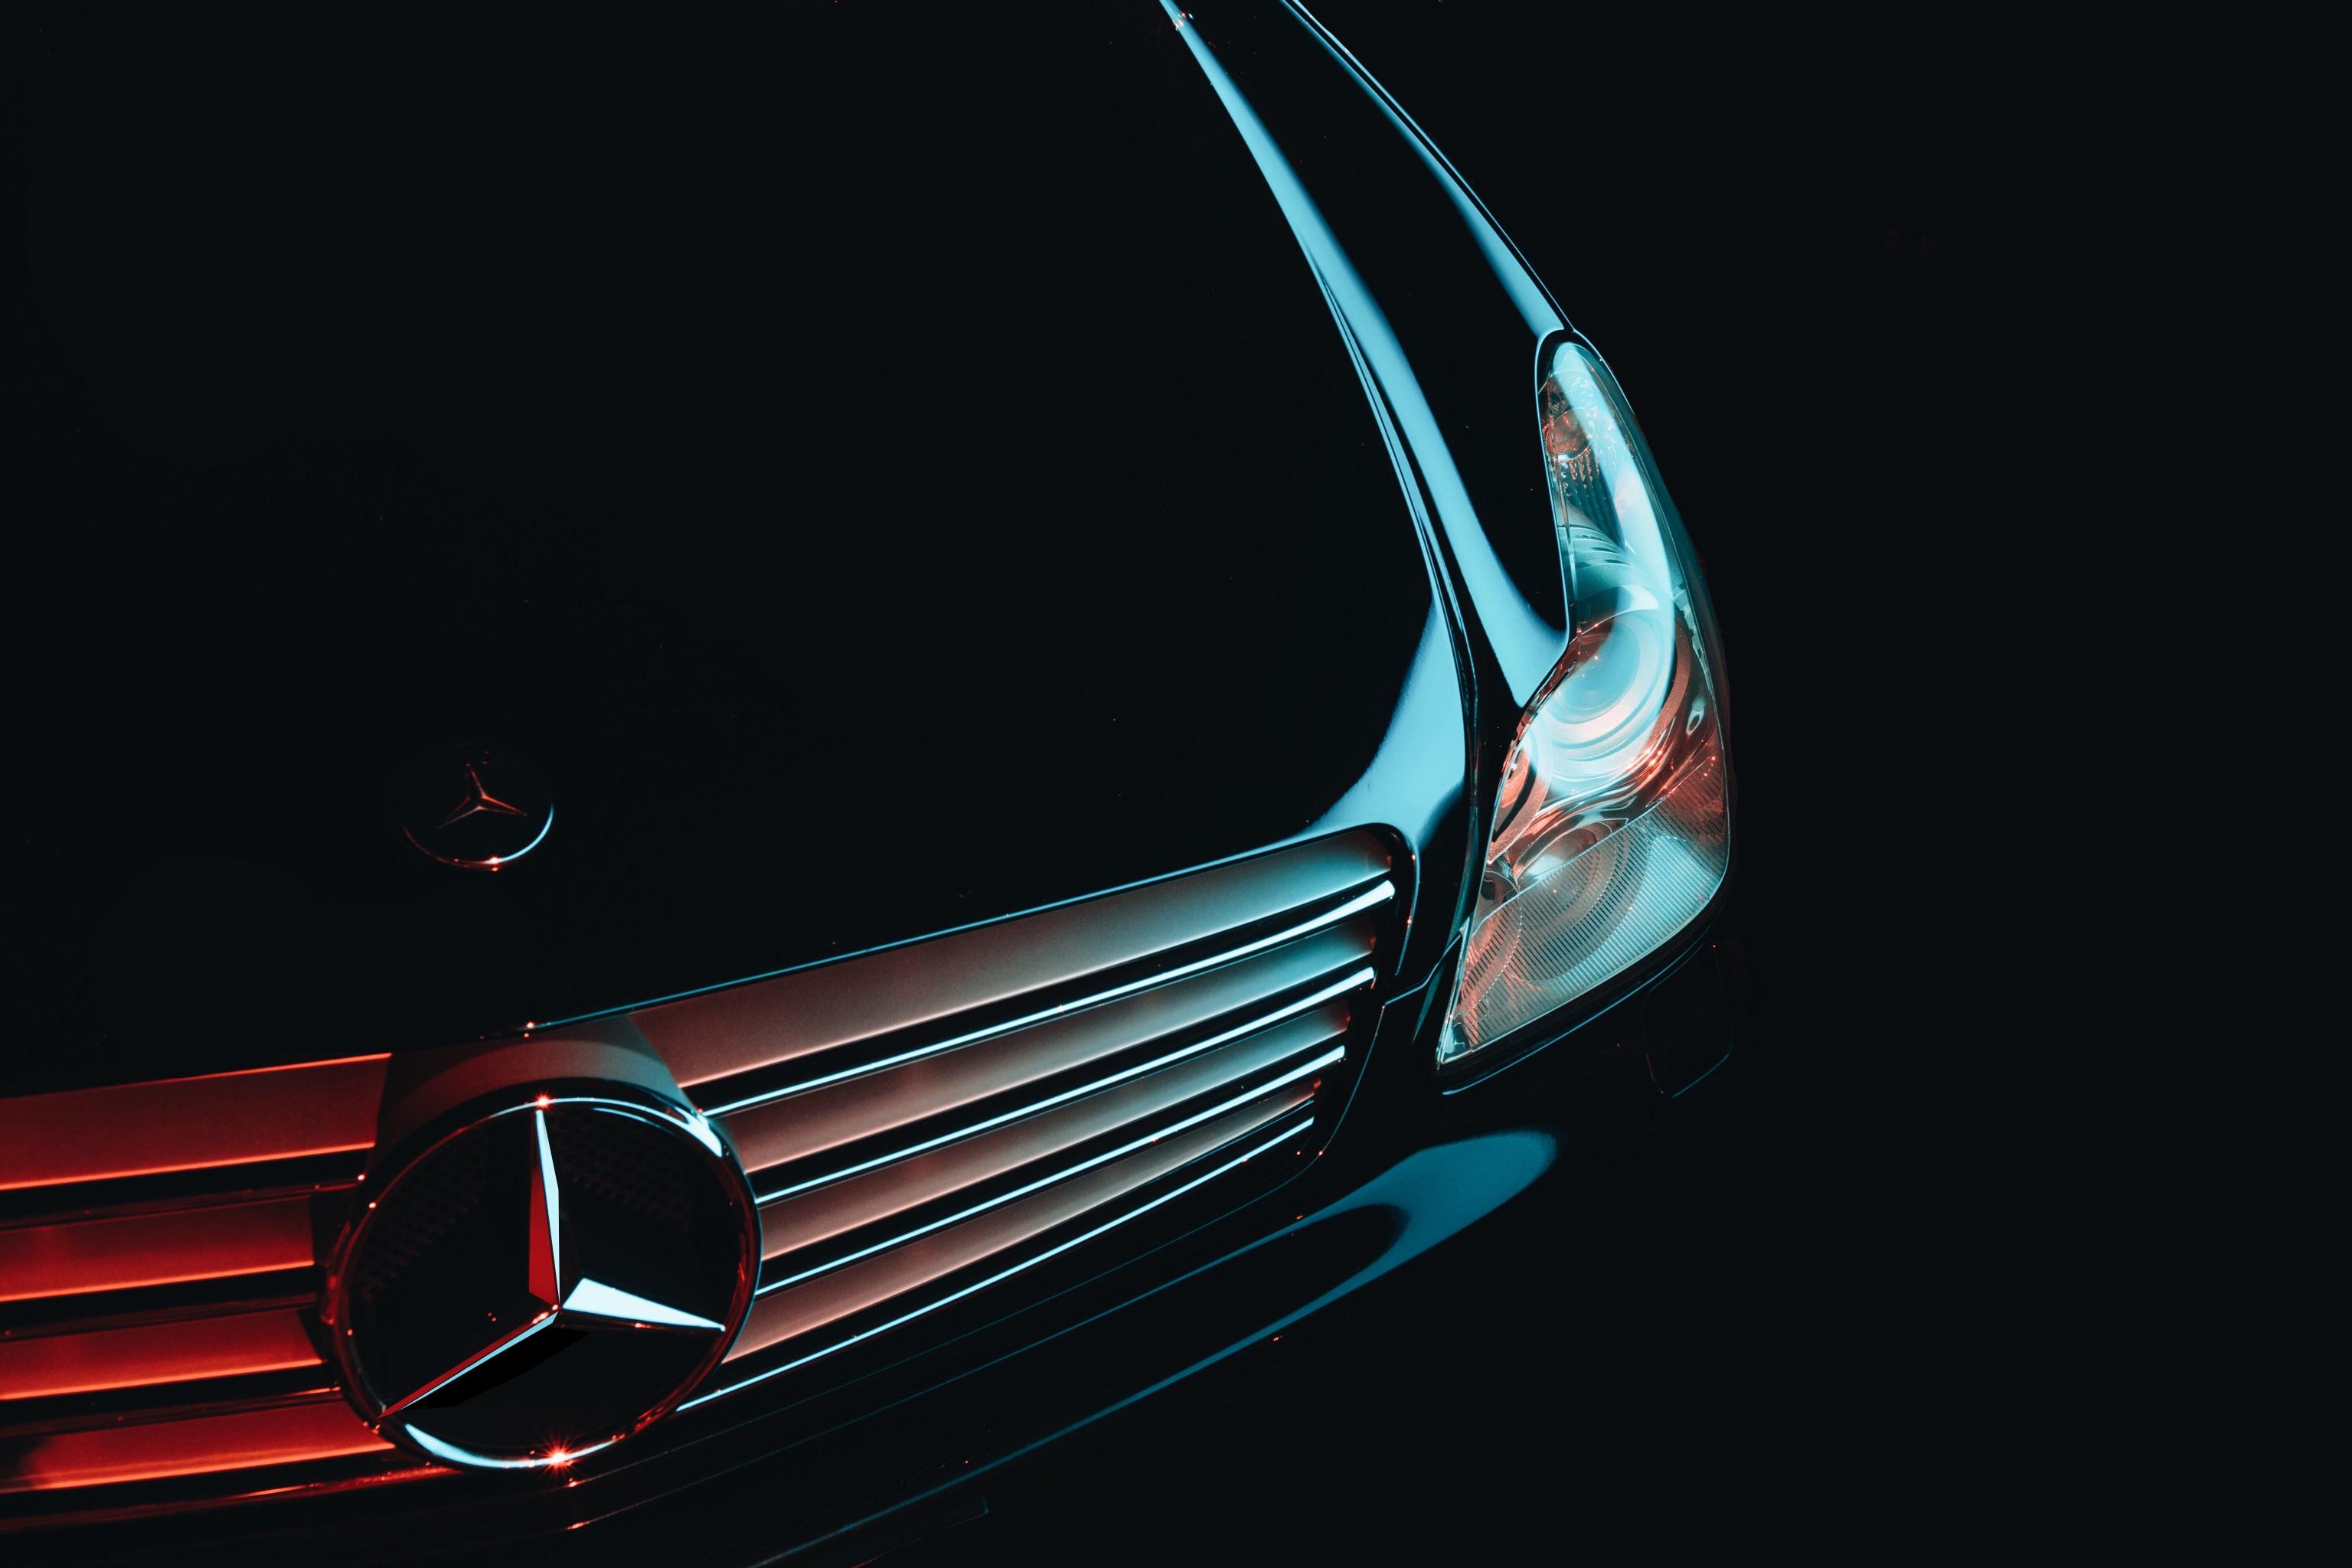 500 Mercedes Benz Pictures Download Free Images On Unsplash